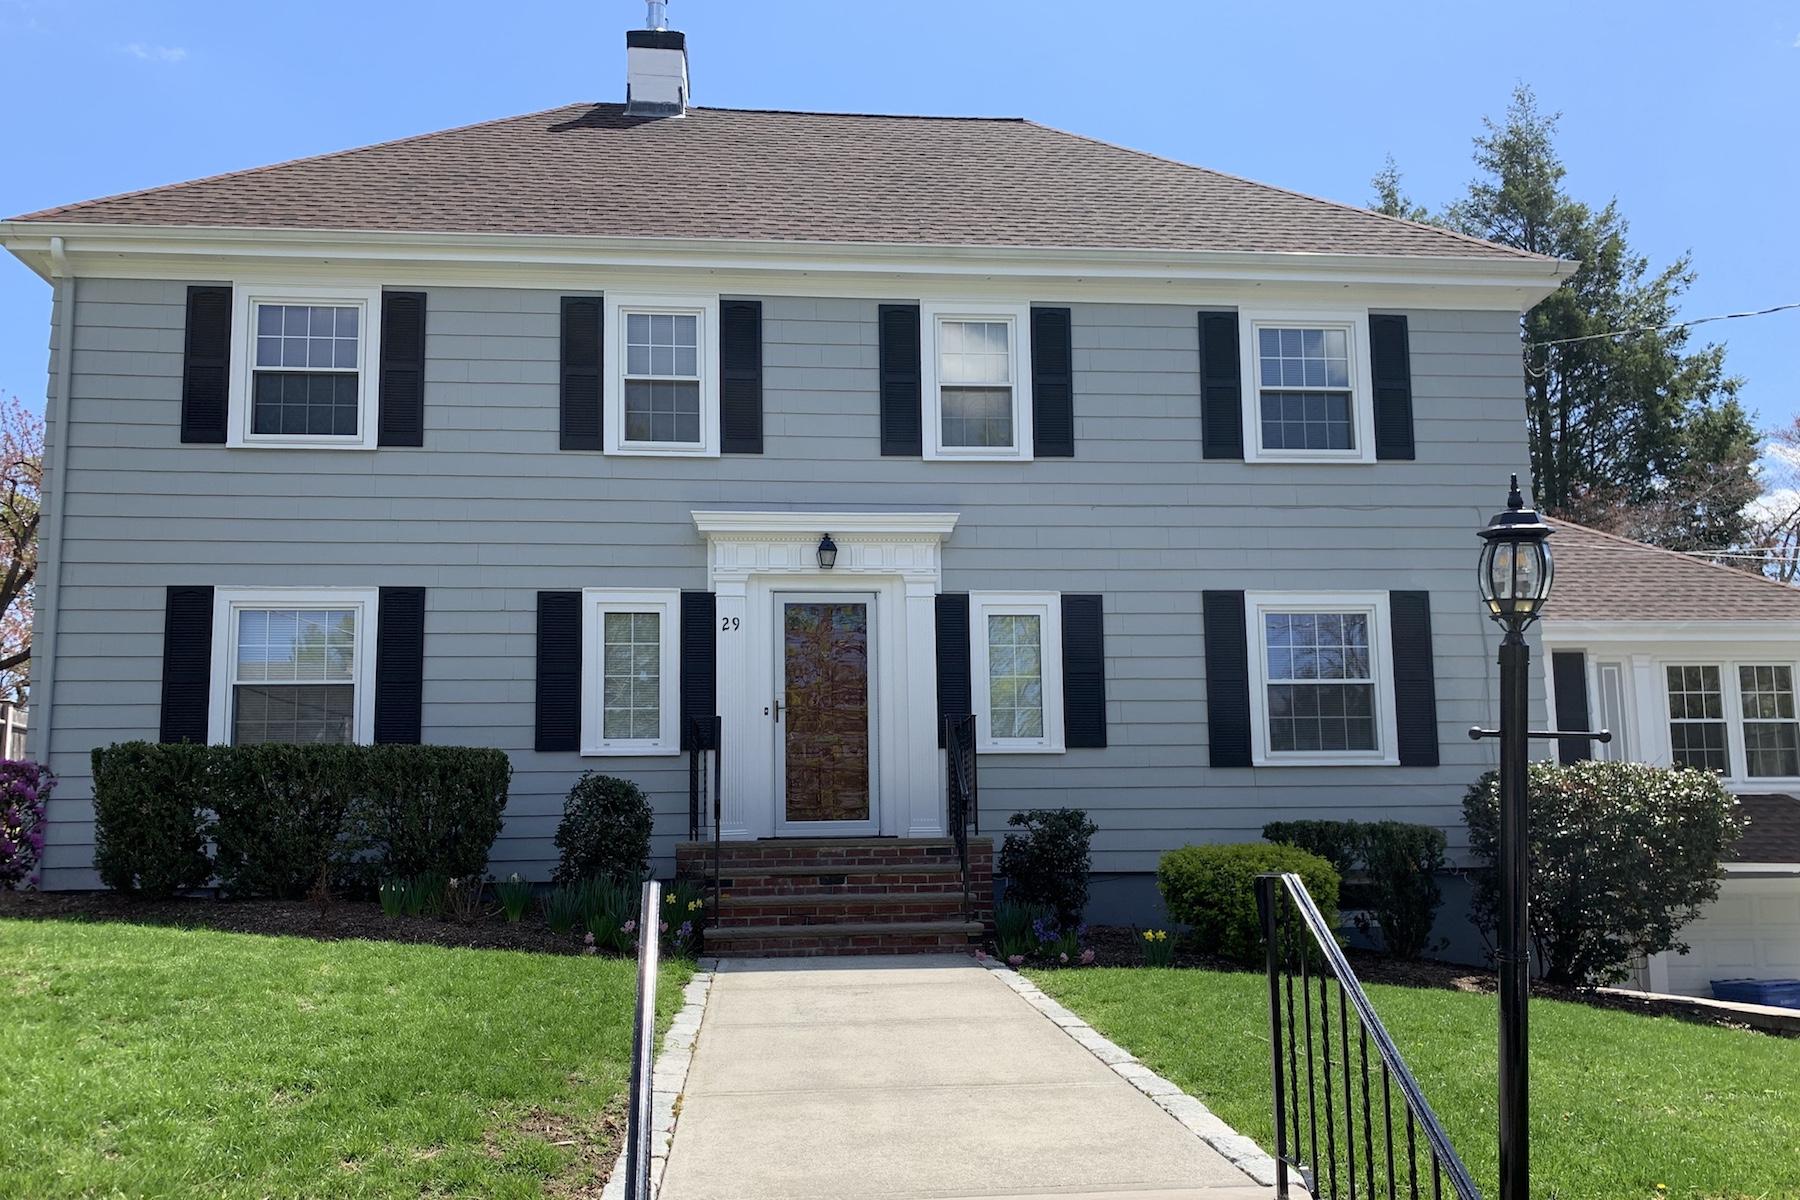 Single Family Home for Active at 29 Homer Road 29 Homer Rd Belmont, Massachusetts 02478 United States